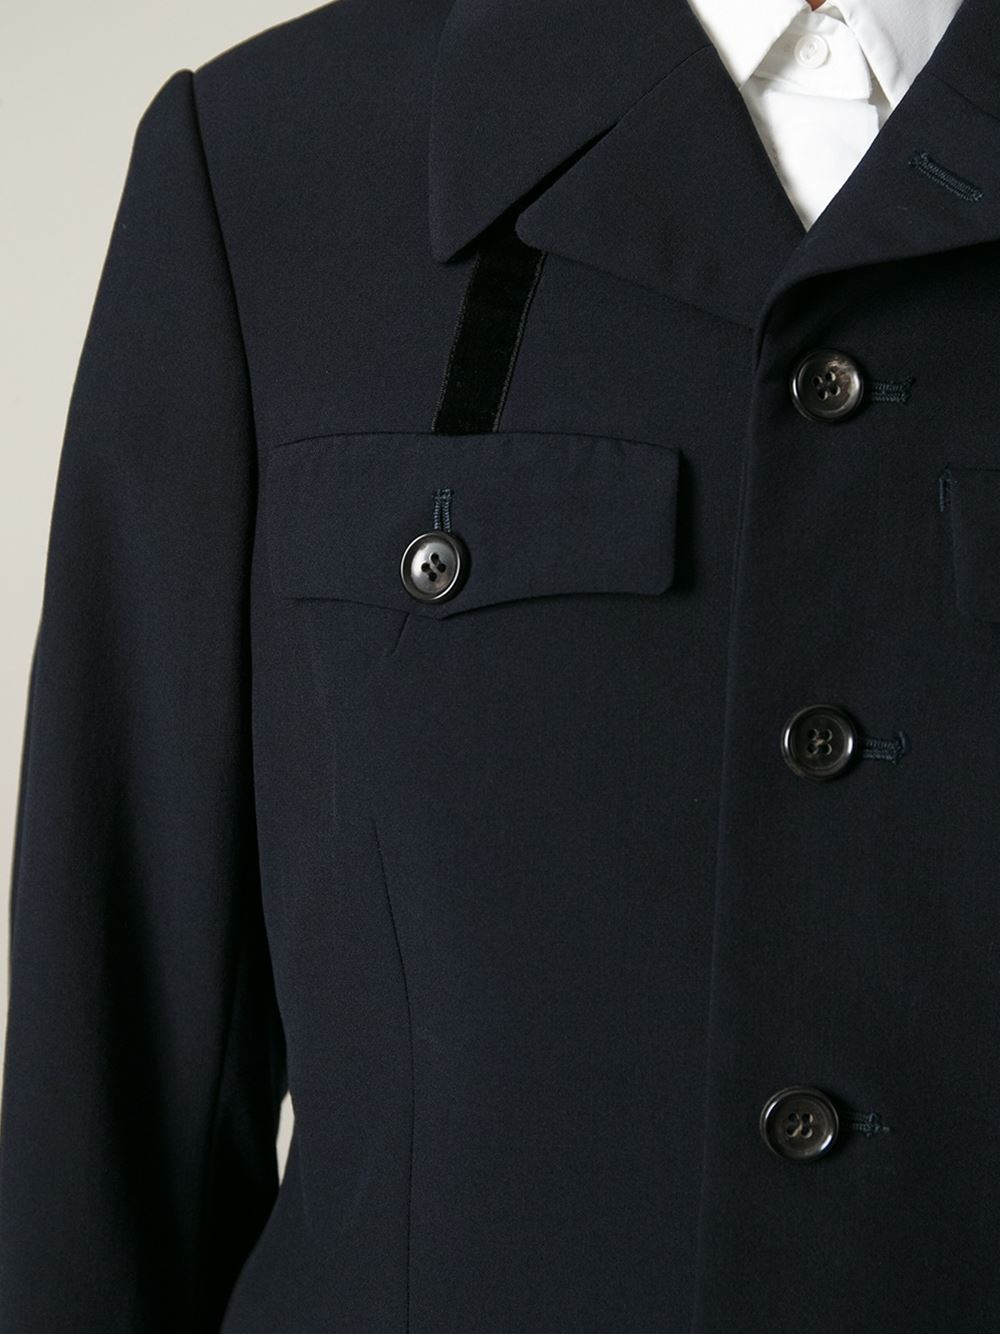 comme des gar ons 39 1997 robe de chambre 39 jacket in blue lyst. Black Bedroom Furniture Sets. Home Design Ideas